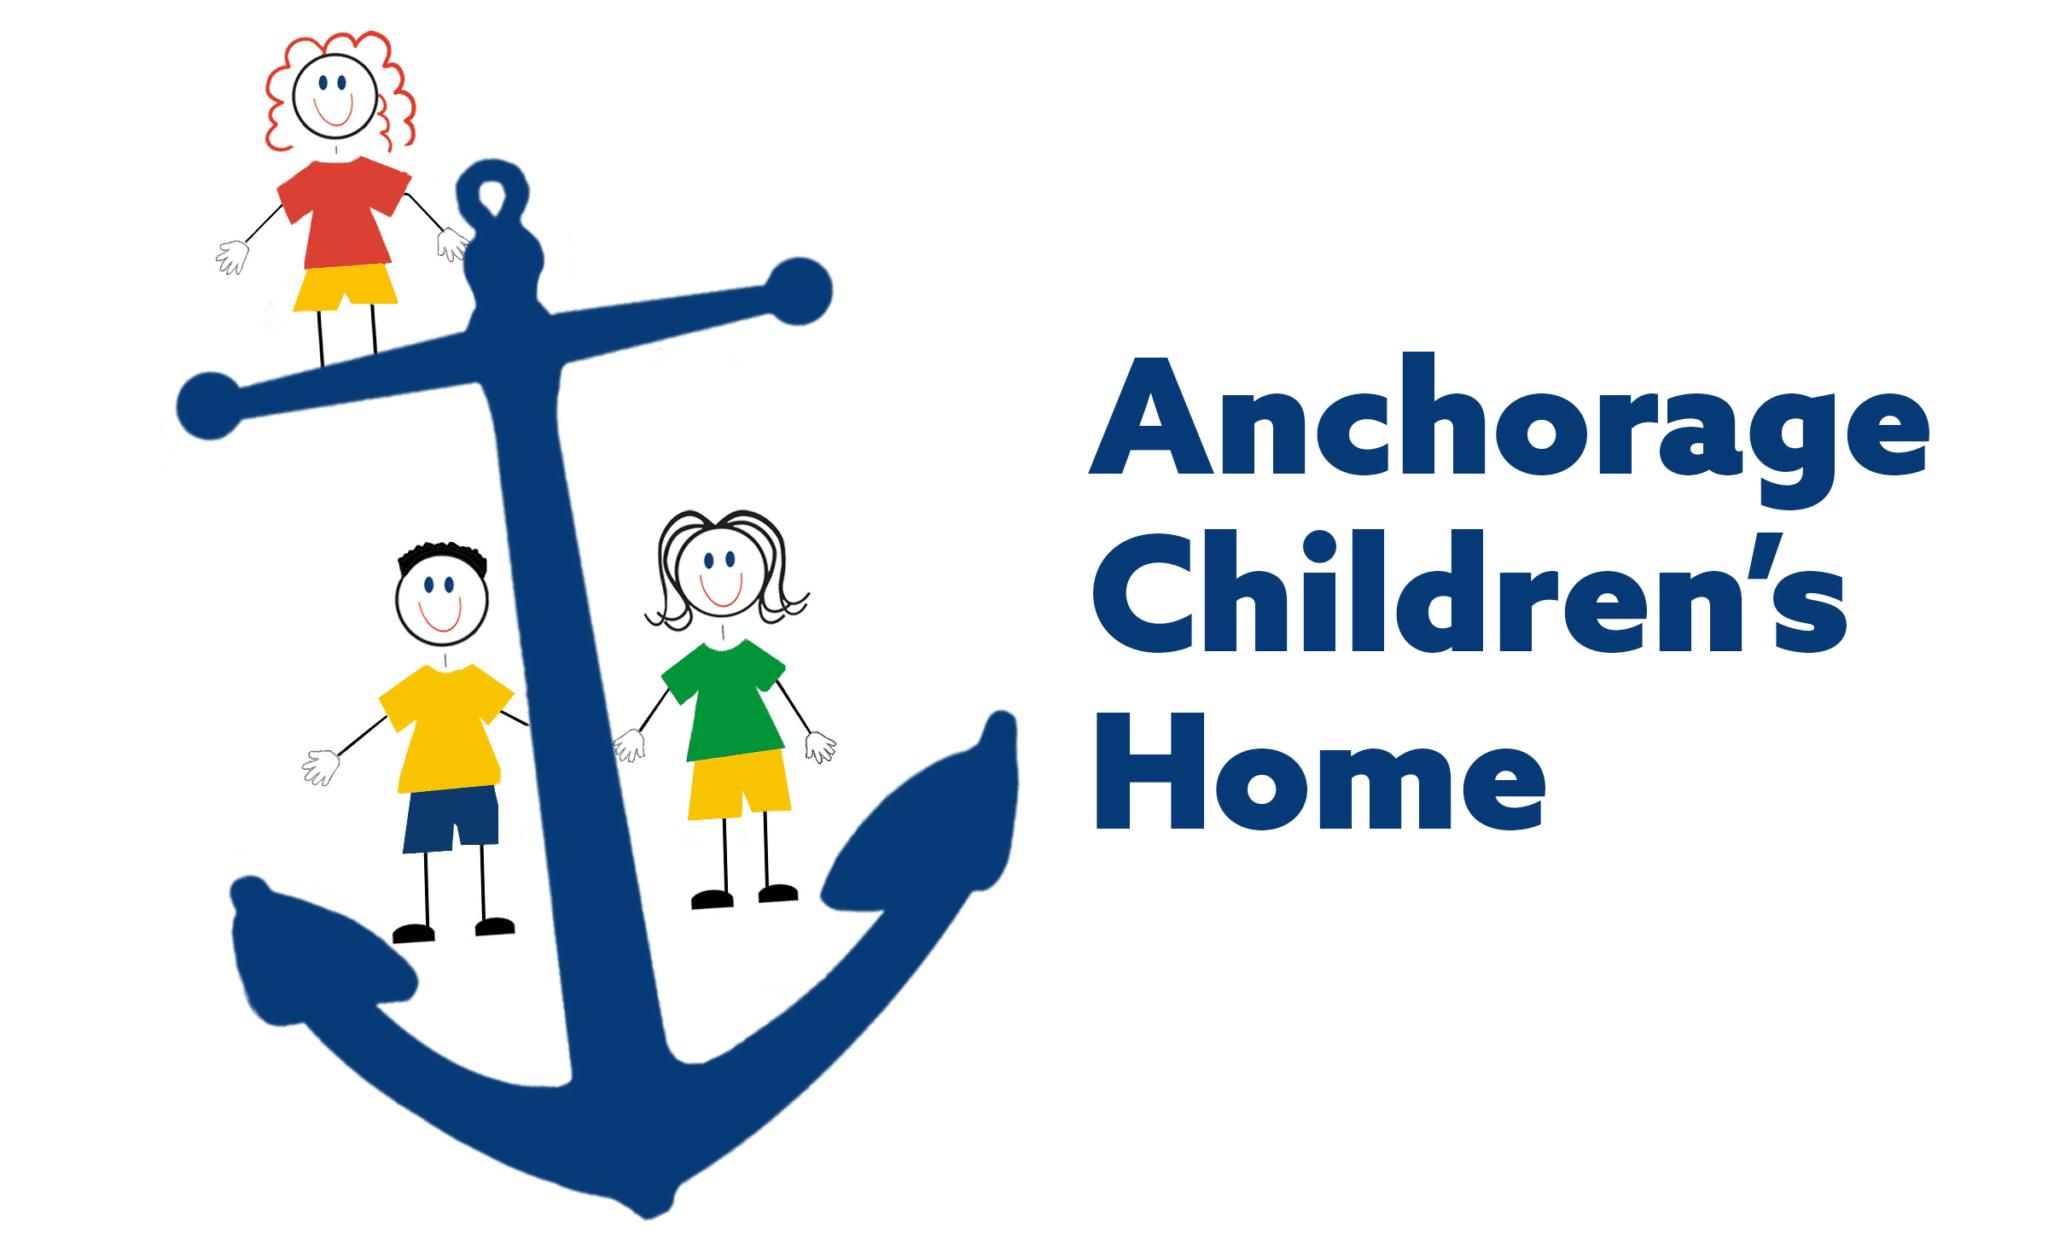 http://www.anchoragechildrenshome.org/